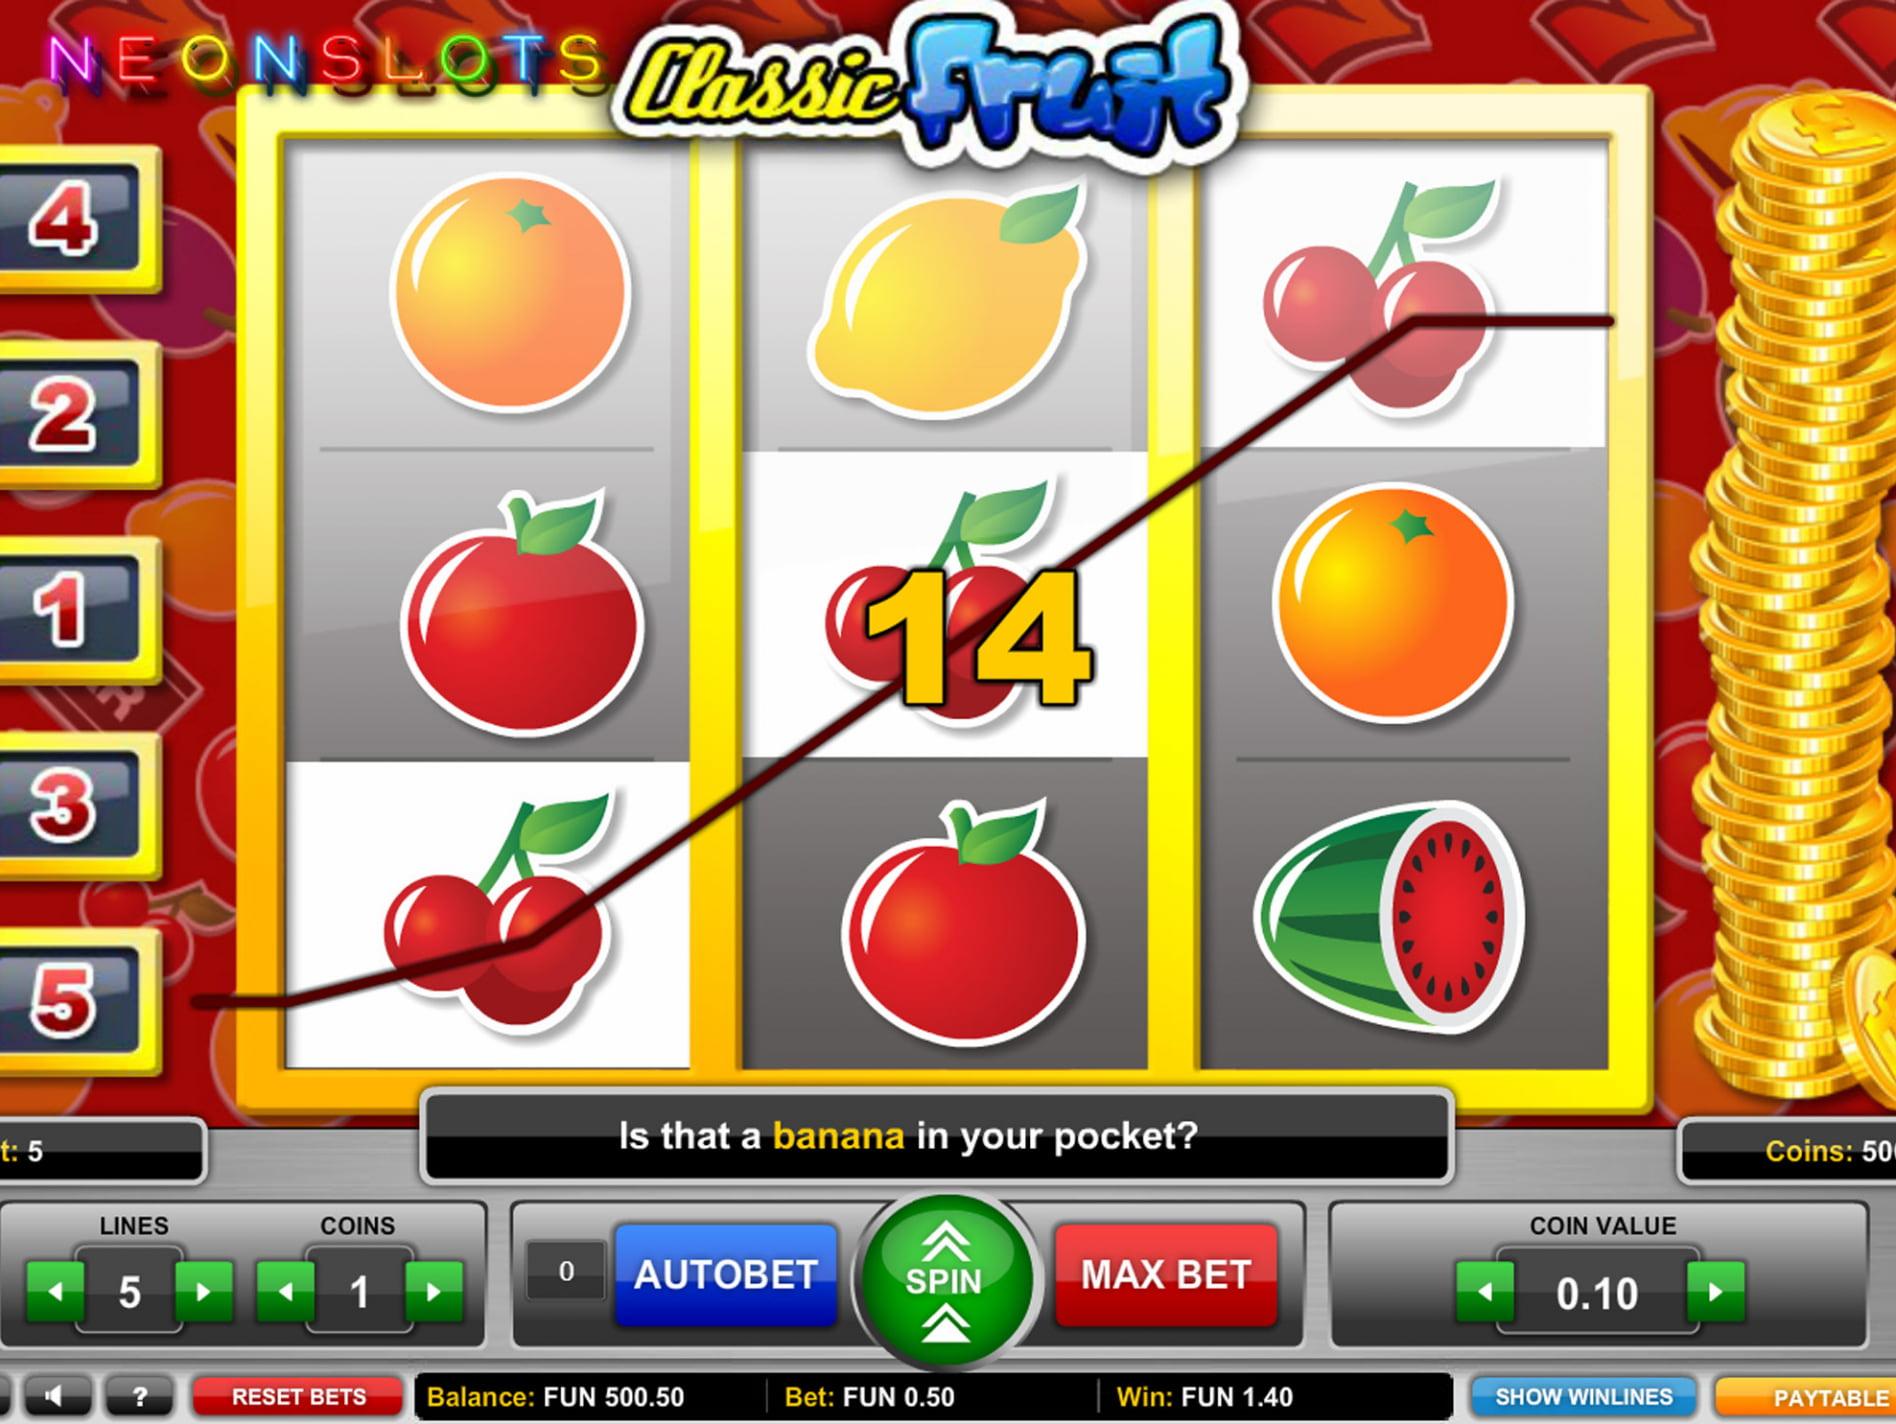 Bonos de 21 Newest Gaming bingo gratis online - 12965